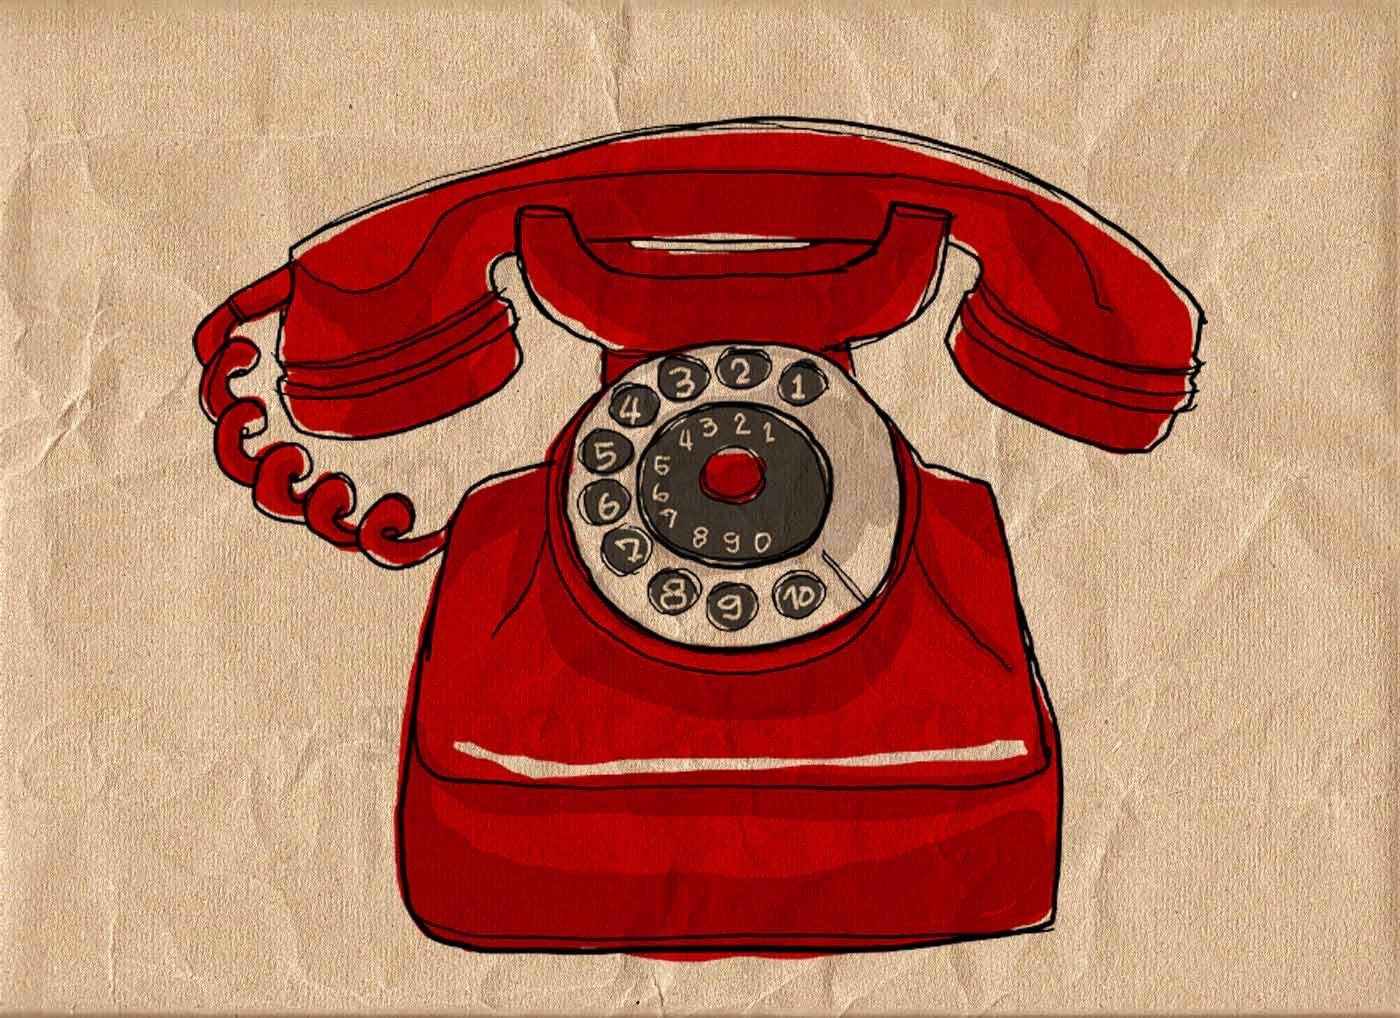 Old Red Telephone Digital Image Sheet Original Illustrate